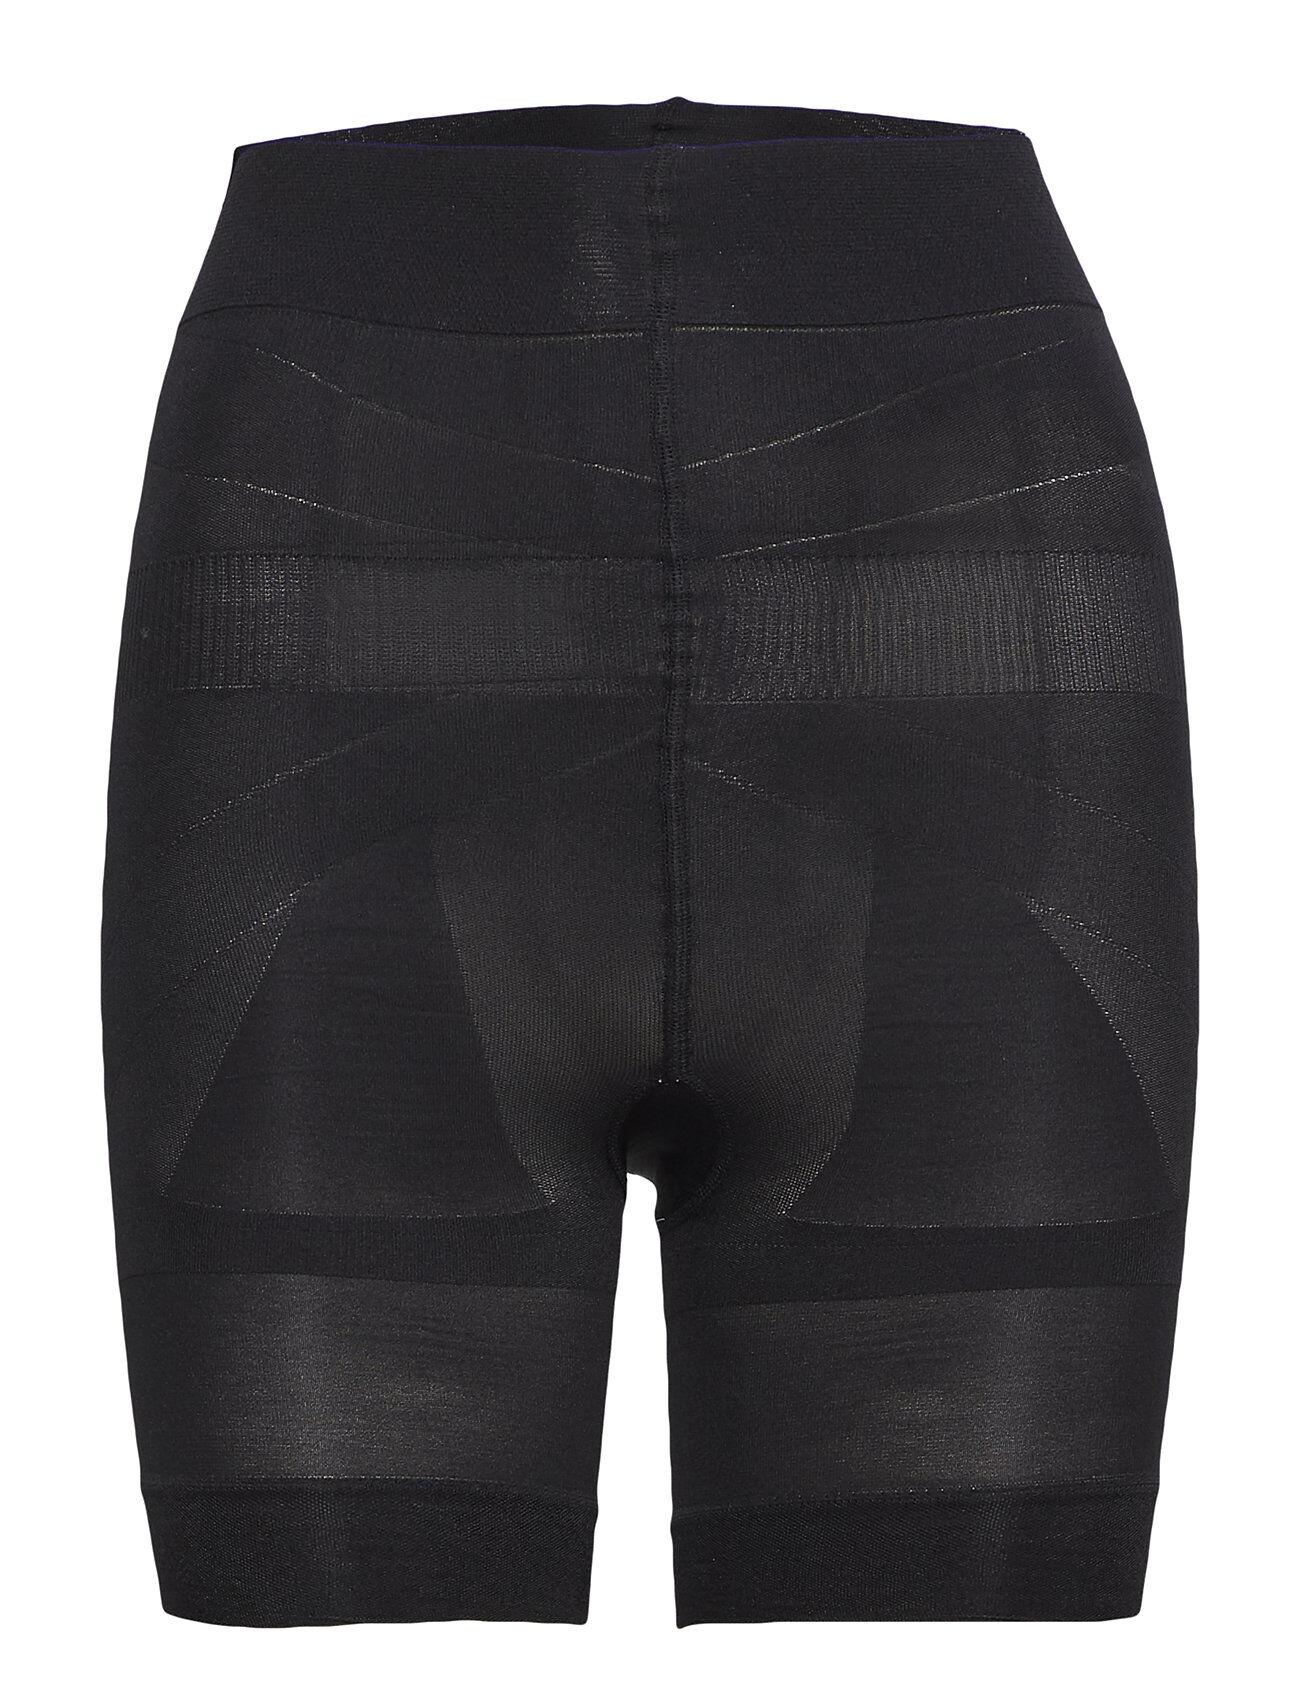 Swedish Stockings Julia Shaping Shorts Lingerie Shapewear Bottoms Musta Swedish Stockings